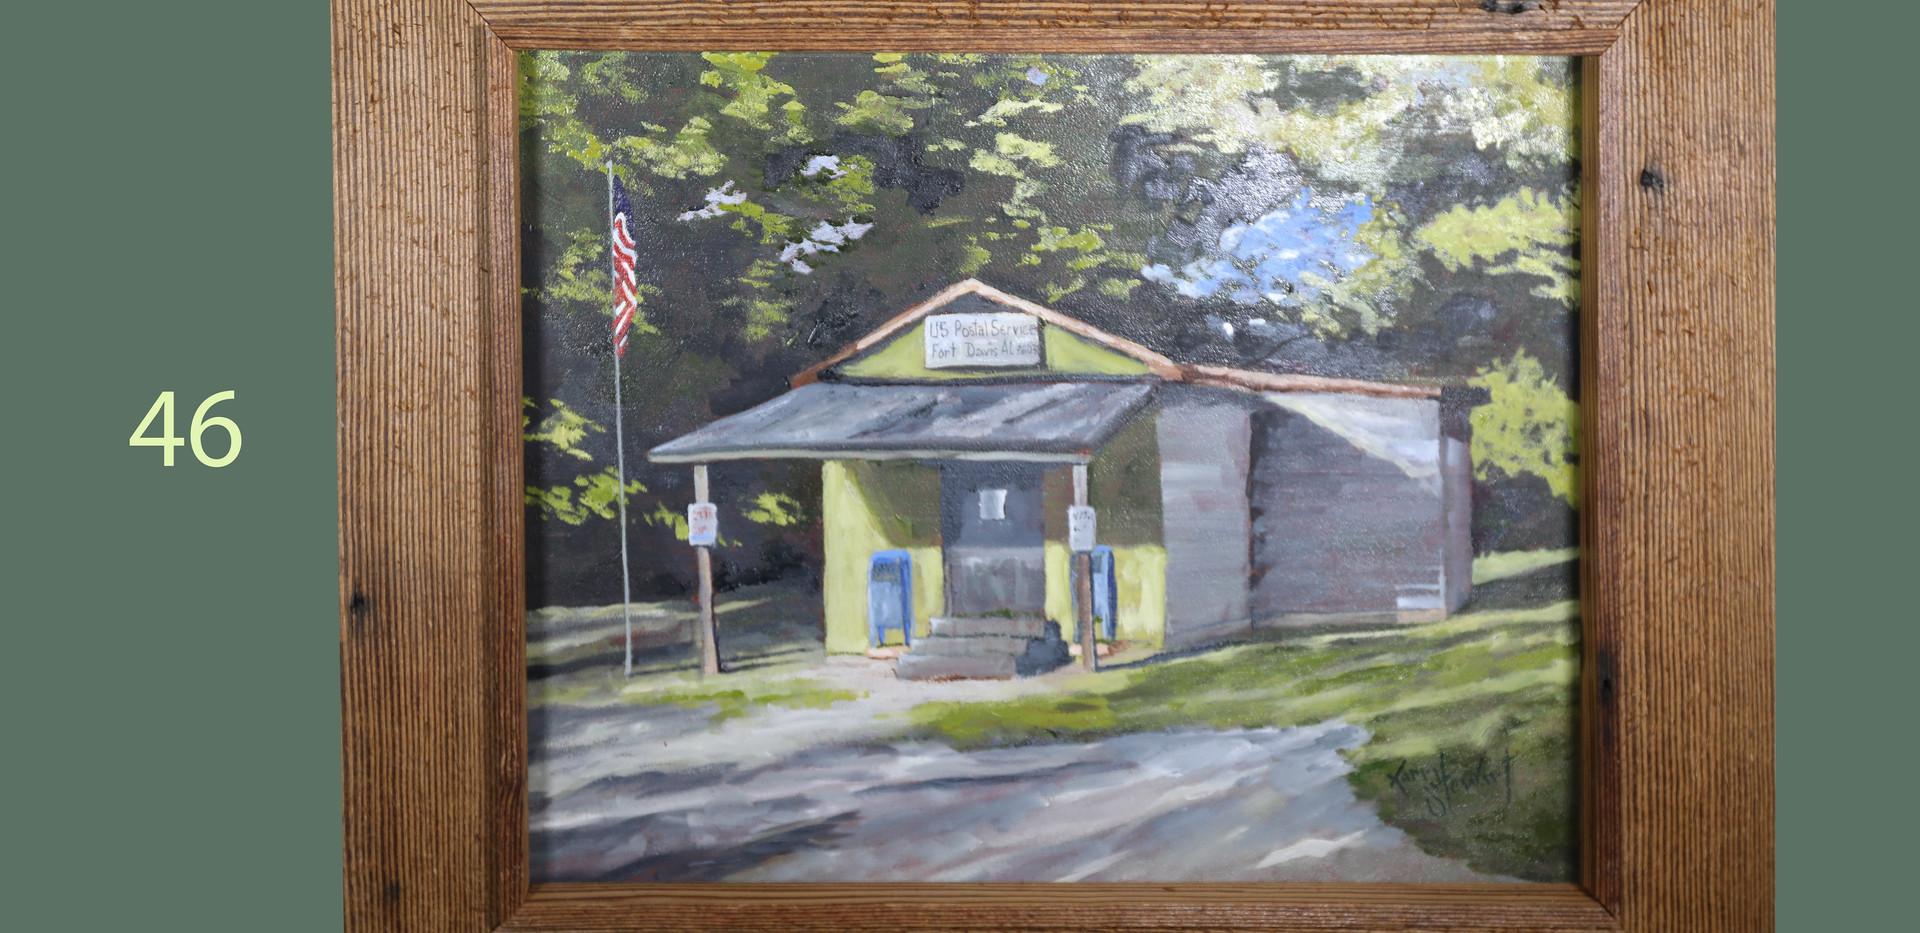 Fort Davis AL Post Office